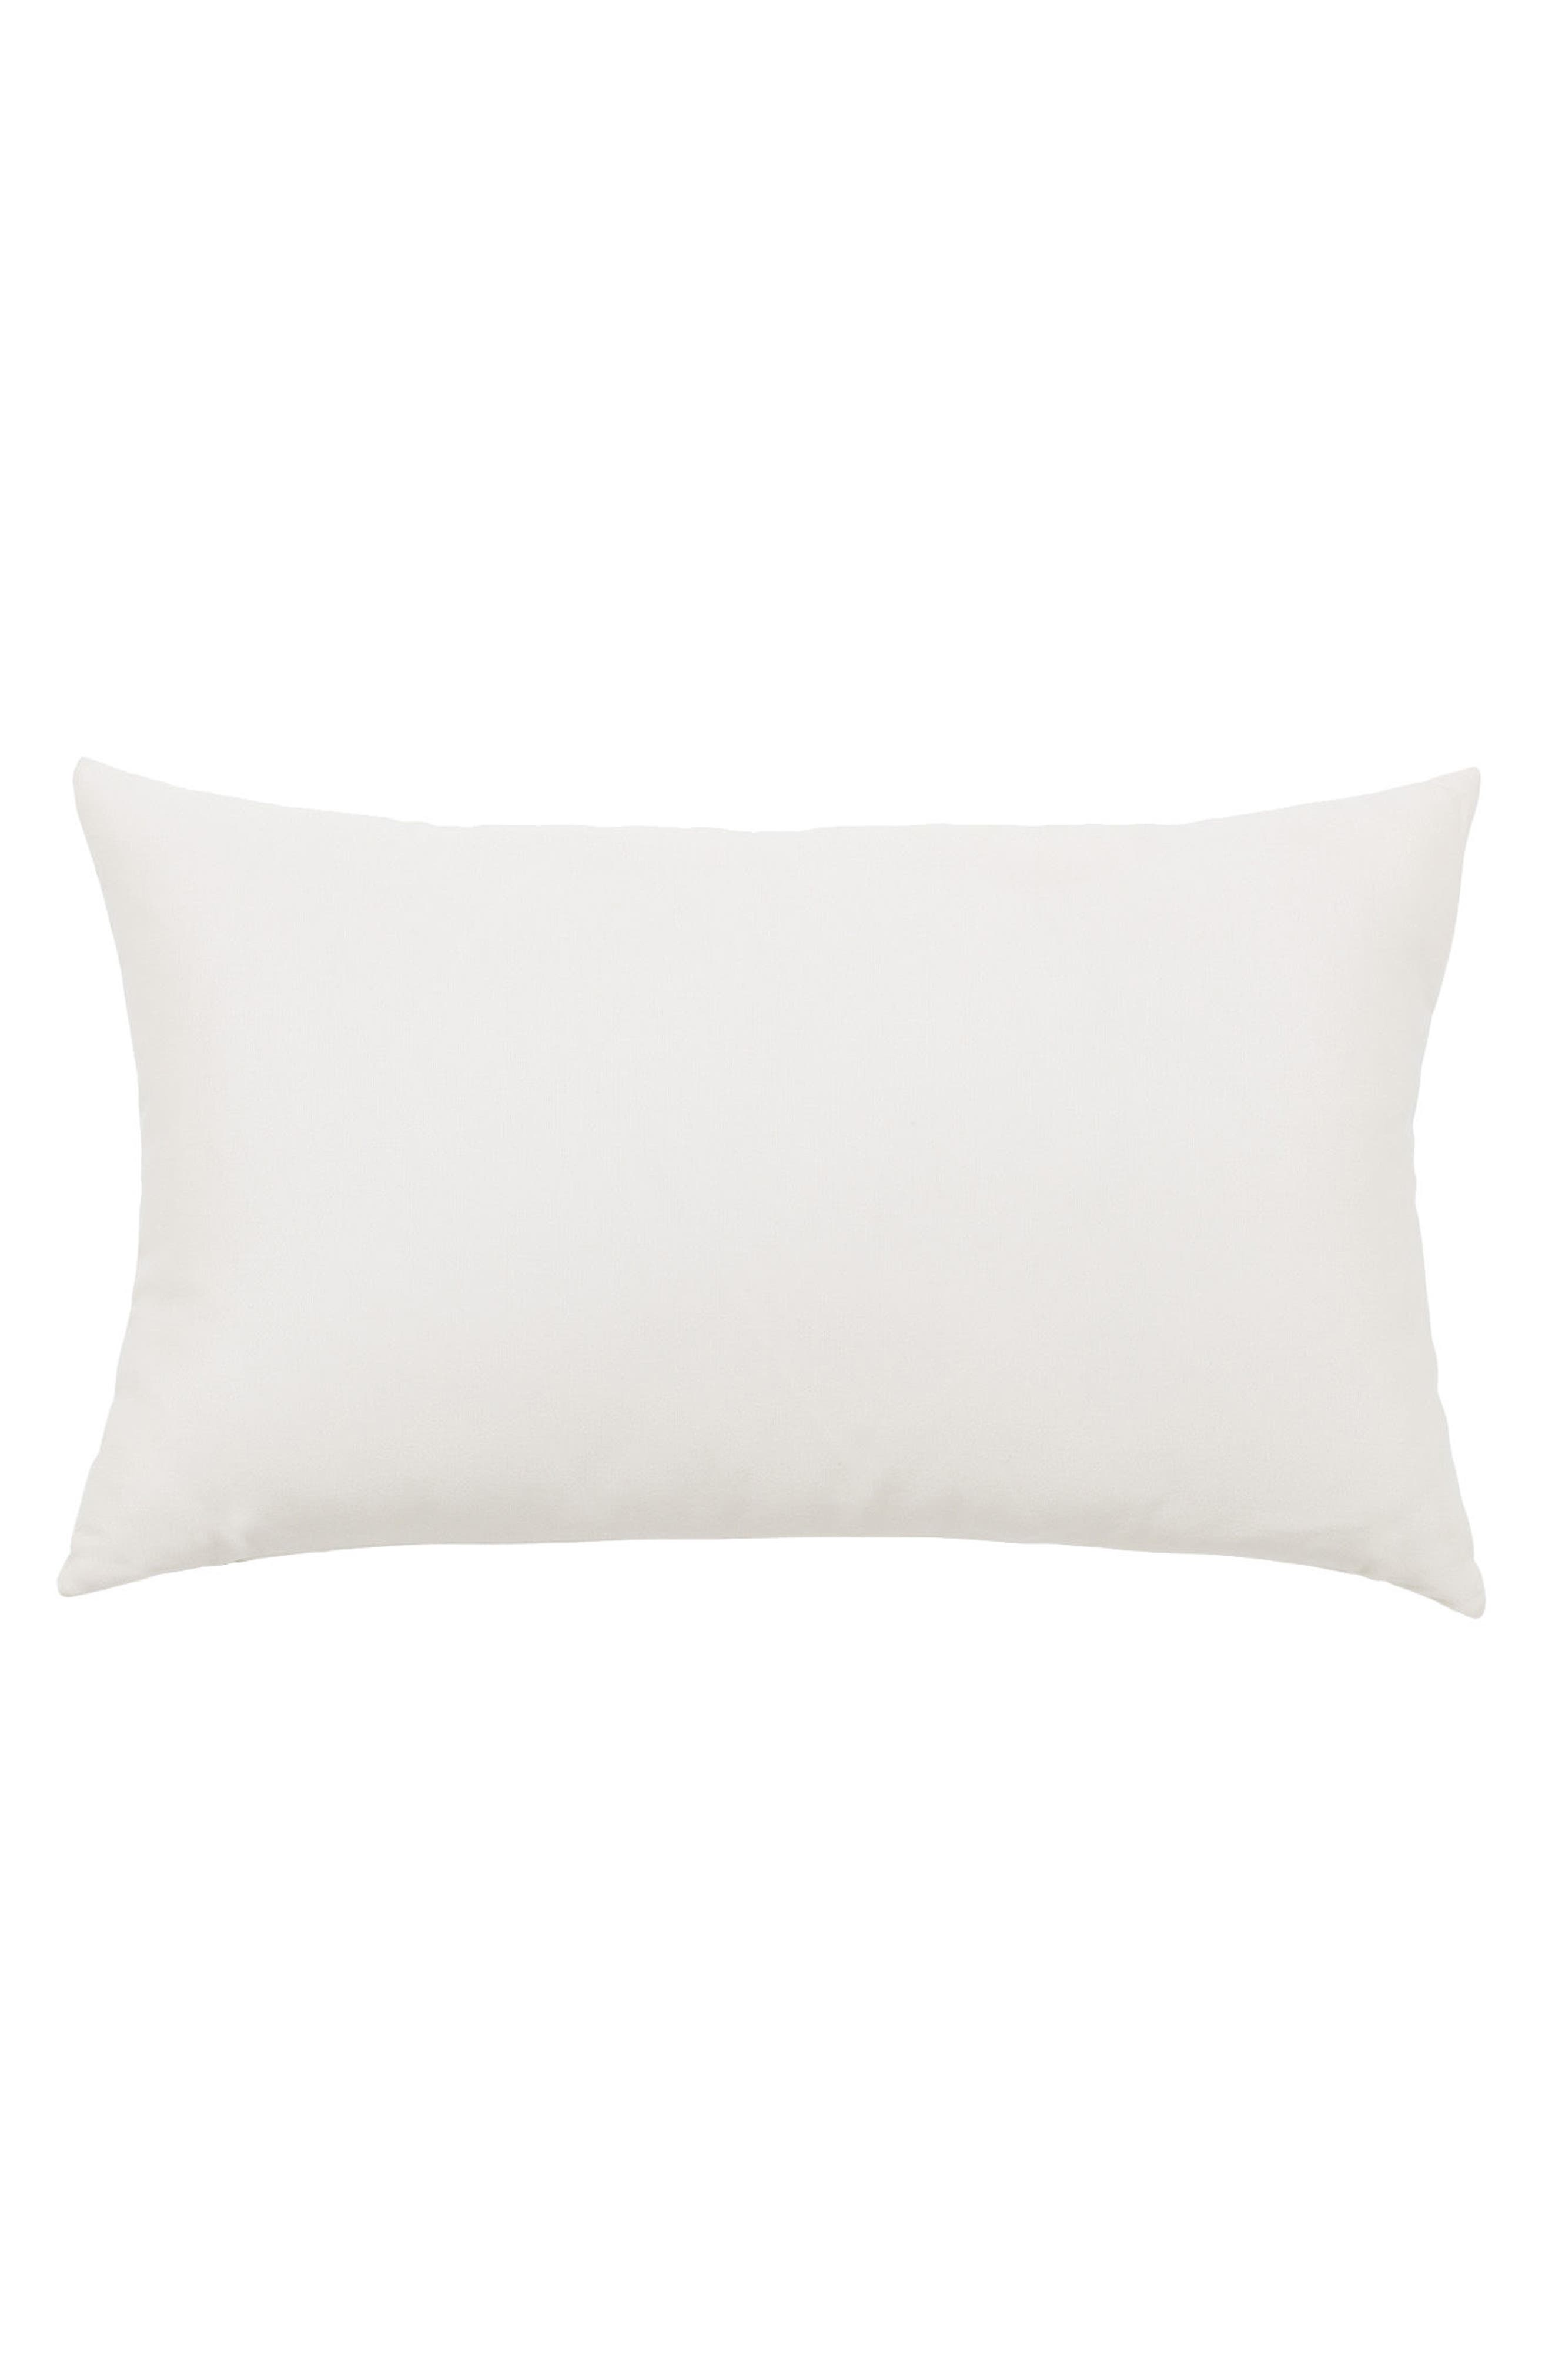 Oceana Deep Sea Lumbar Pillow,                             Alternate thumbnail 2, color,                             BLUE/ GREEN